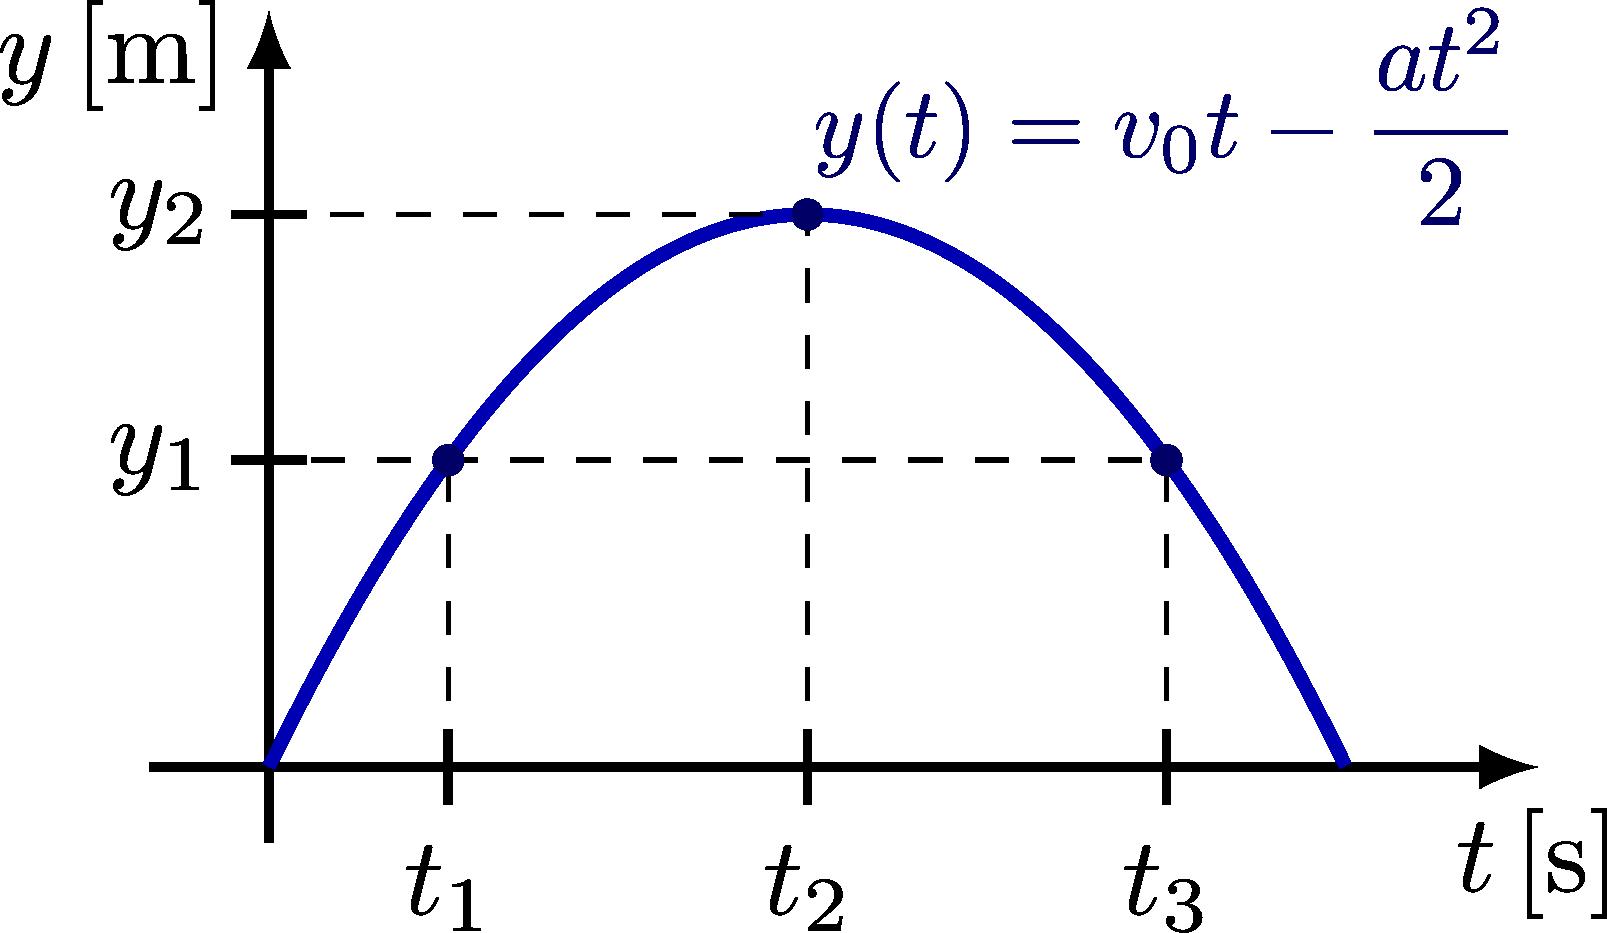 kinematics_curves-006.png